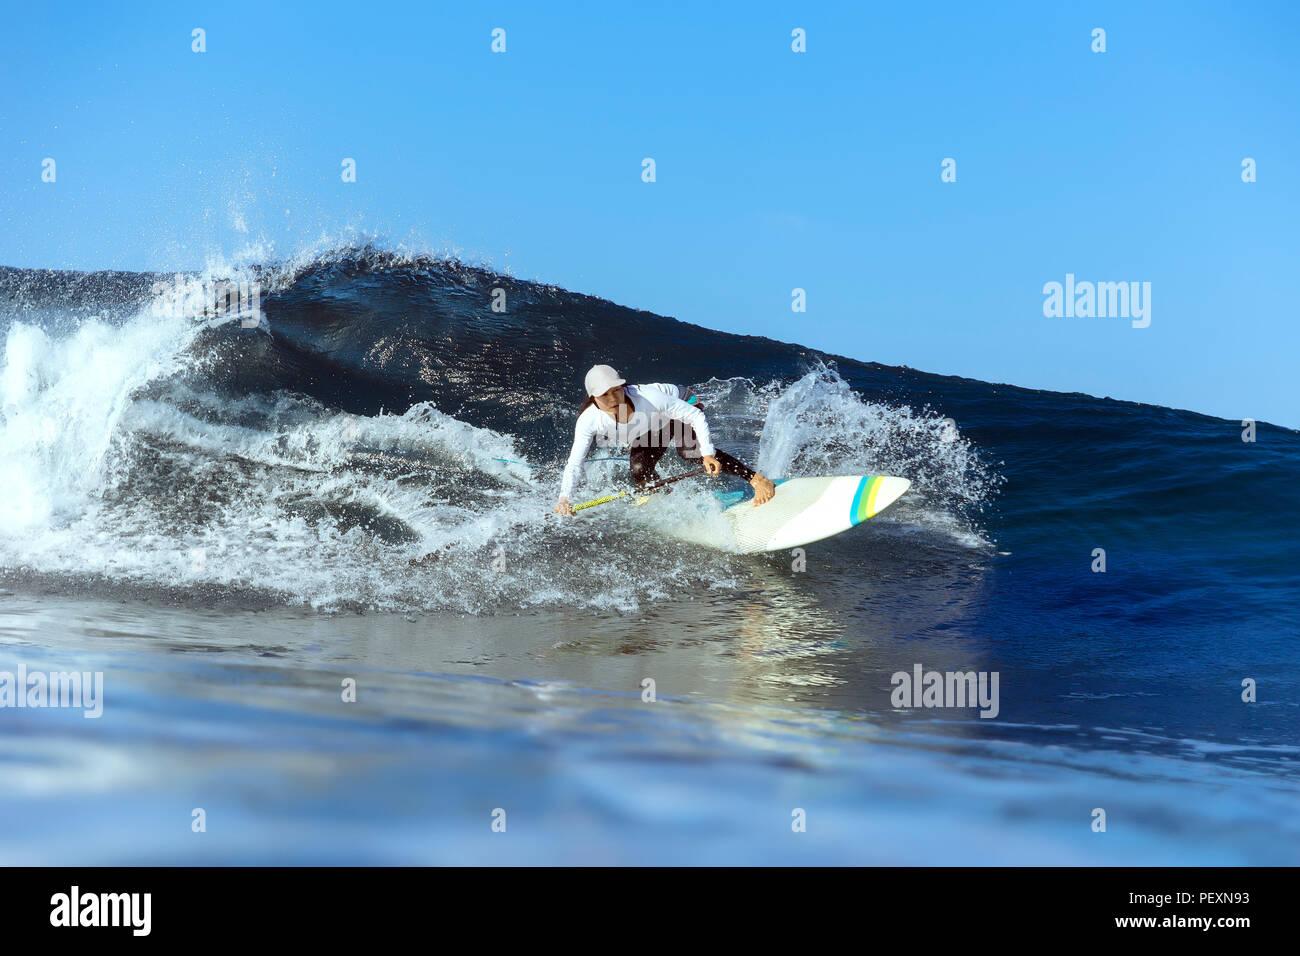 Female surfer riding wave - Stock Image